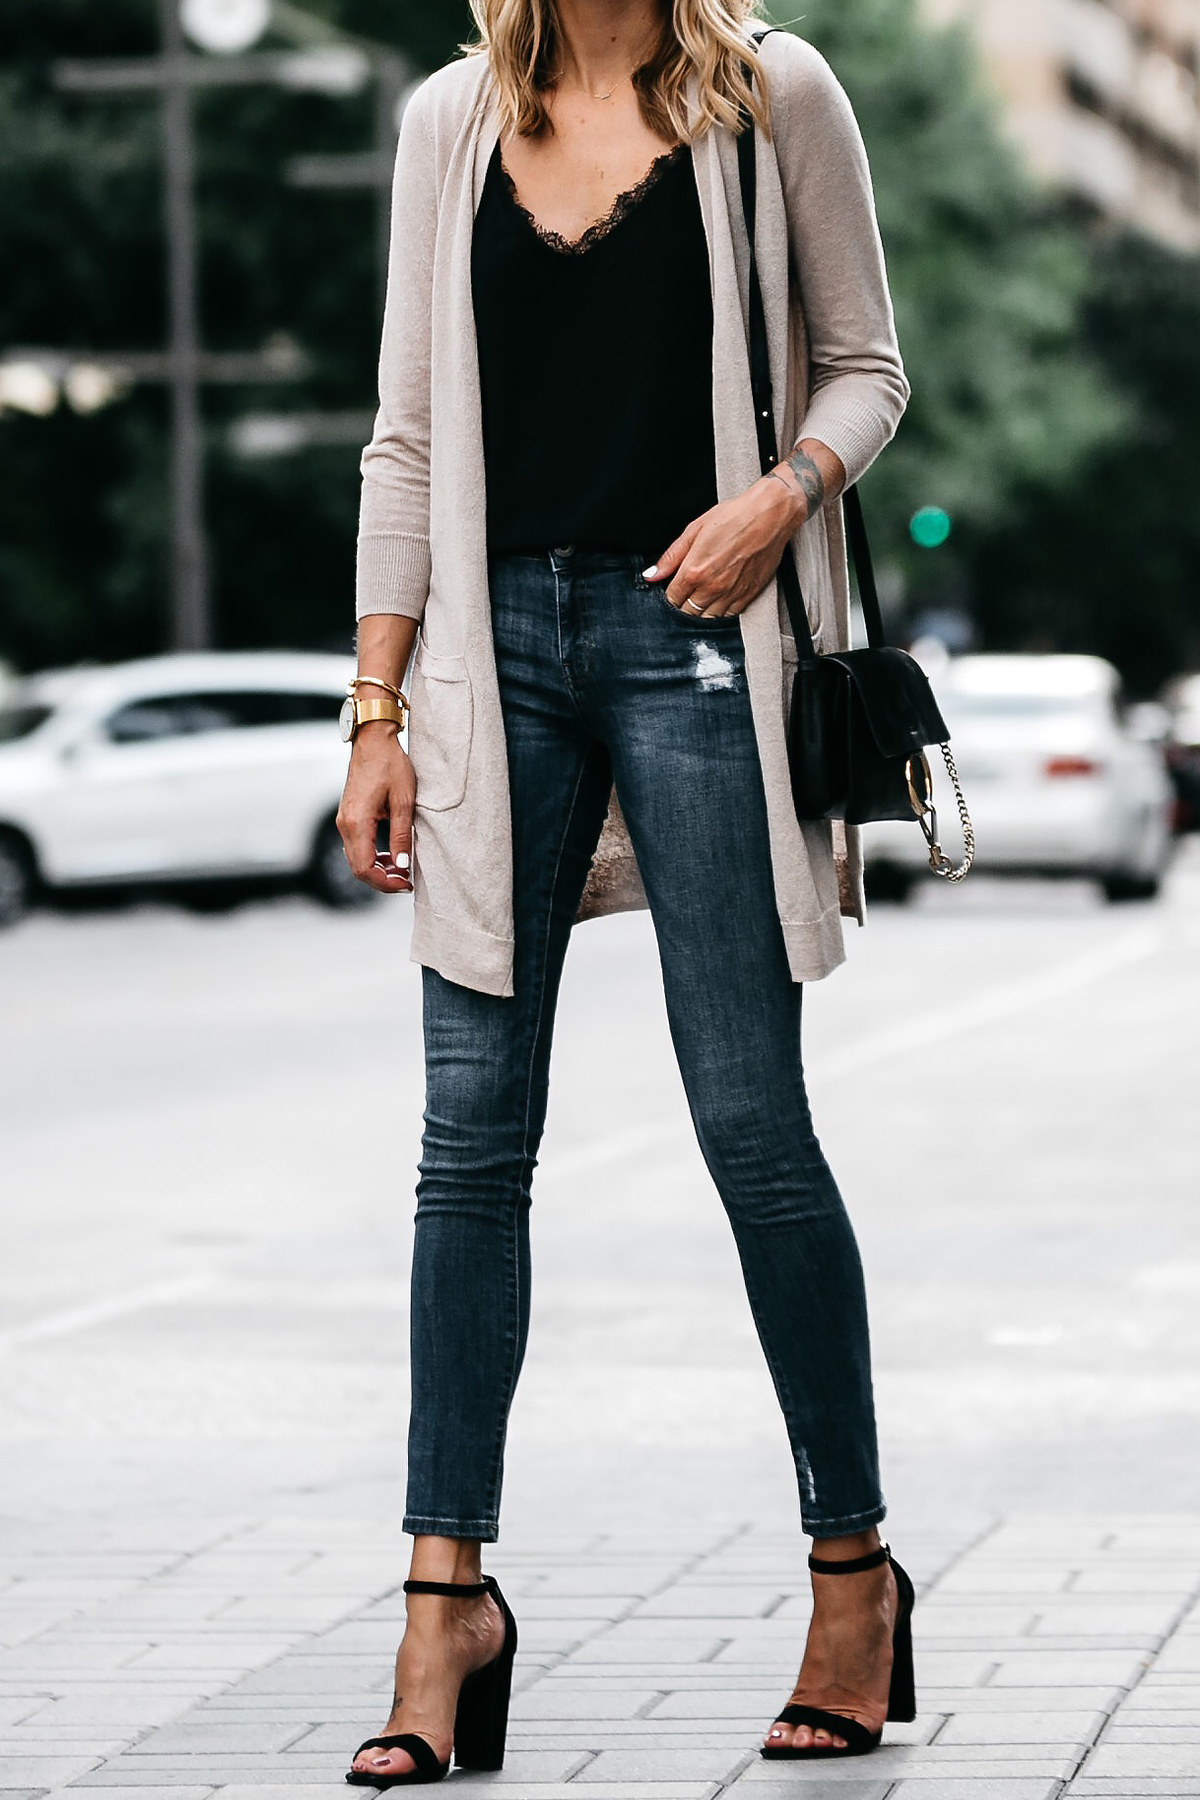 Long Tan Cardigan Black Lace Cami Denim Skinny Jeans Outfit Black Ankle Strap Heeled Sandals Chloe Faye Handbag Fashion Jackson Dallas Blogger Fashion Blogger